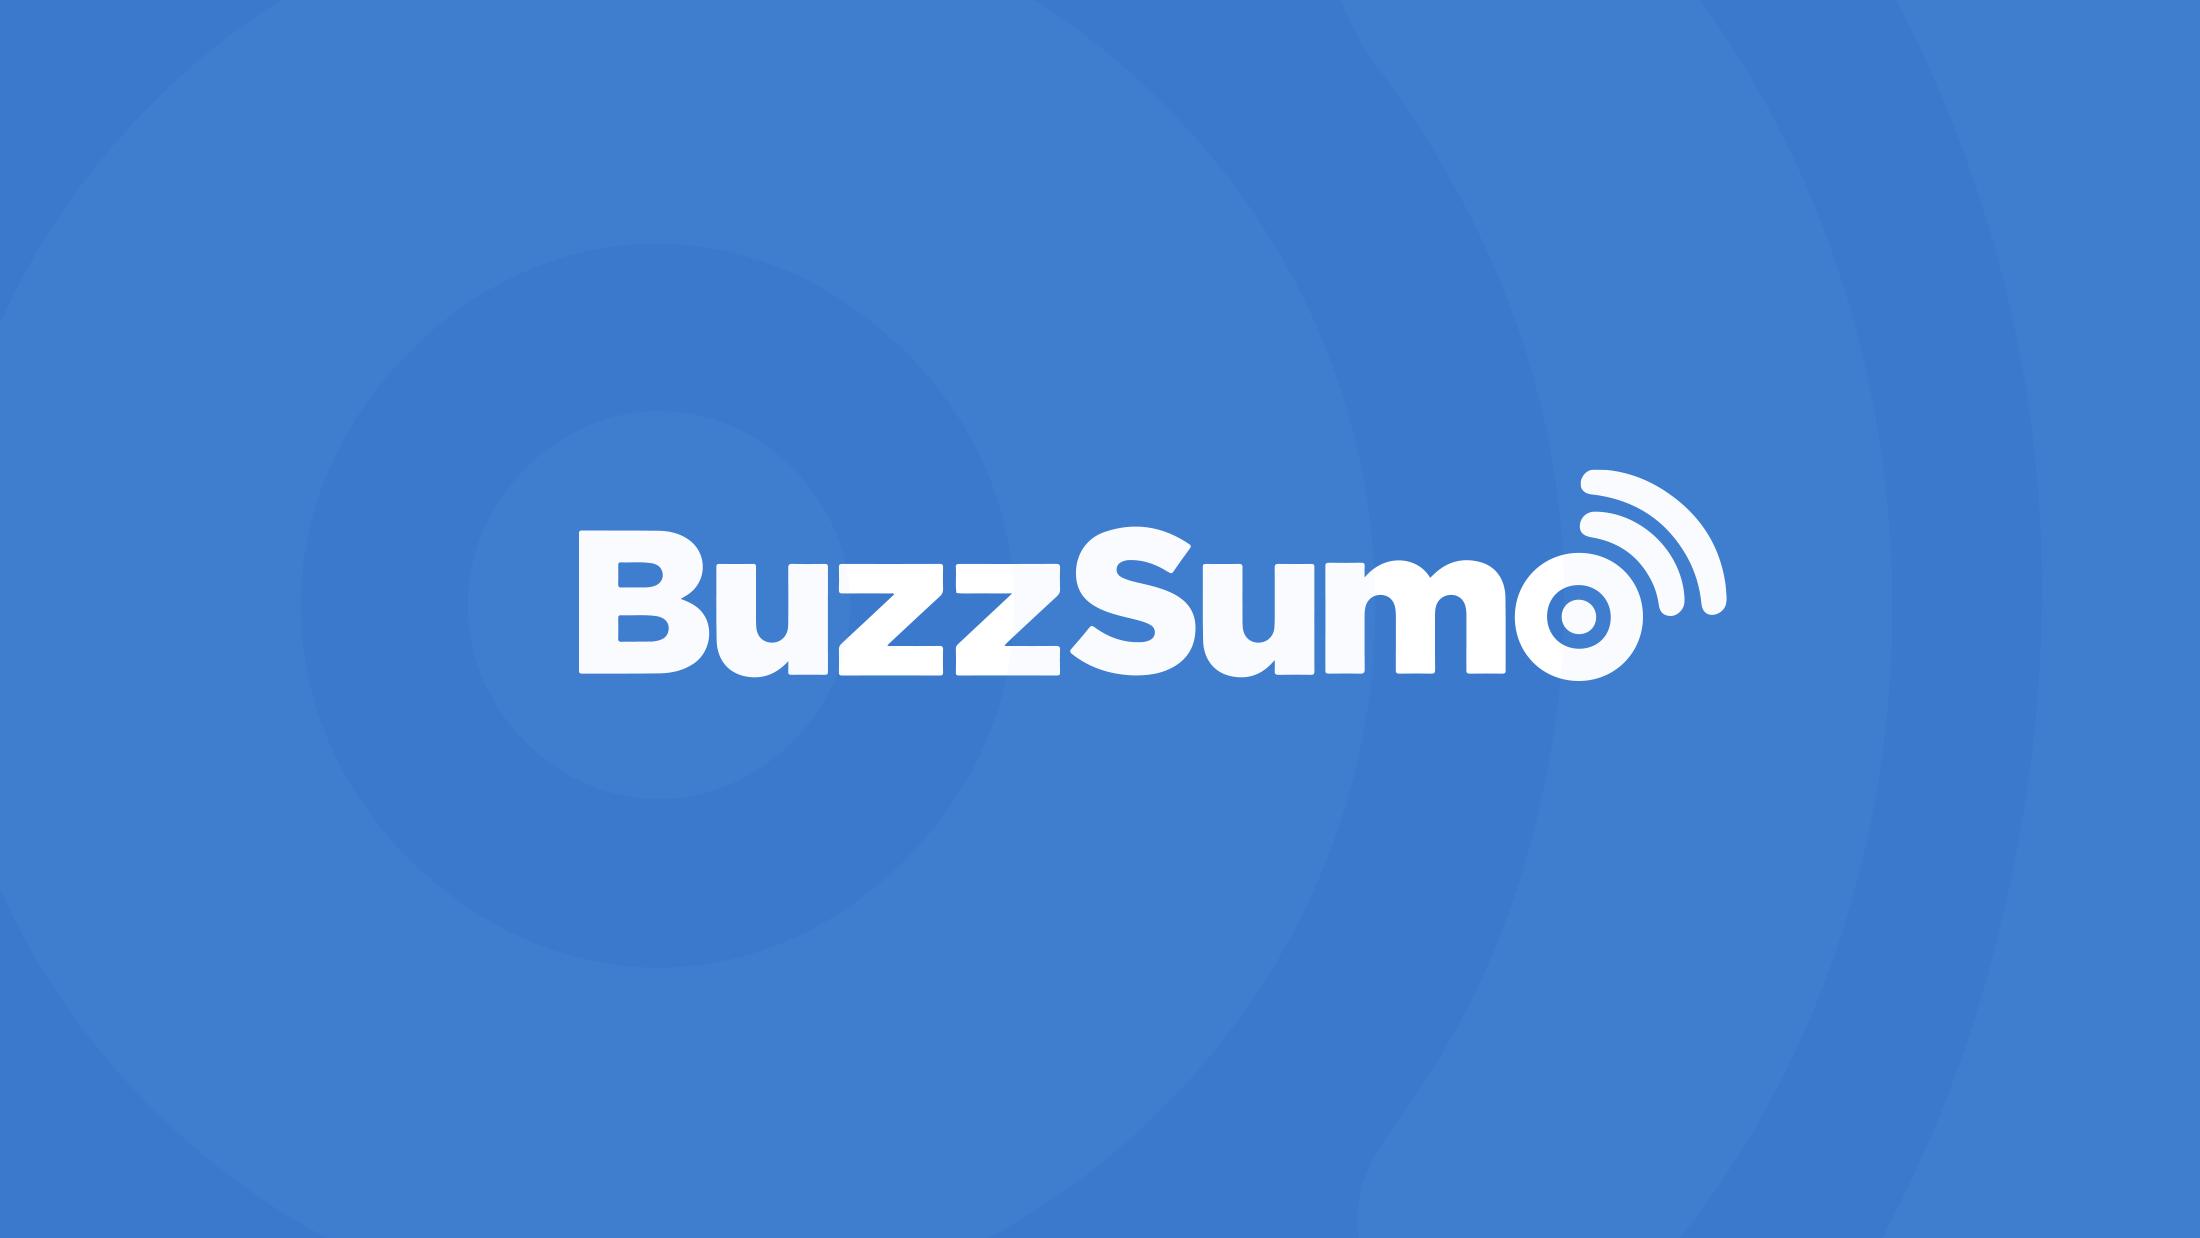 How To Drive 10x Website Traffic Using Buzzsumo | BuzzSumo.com